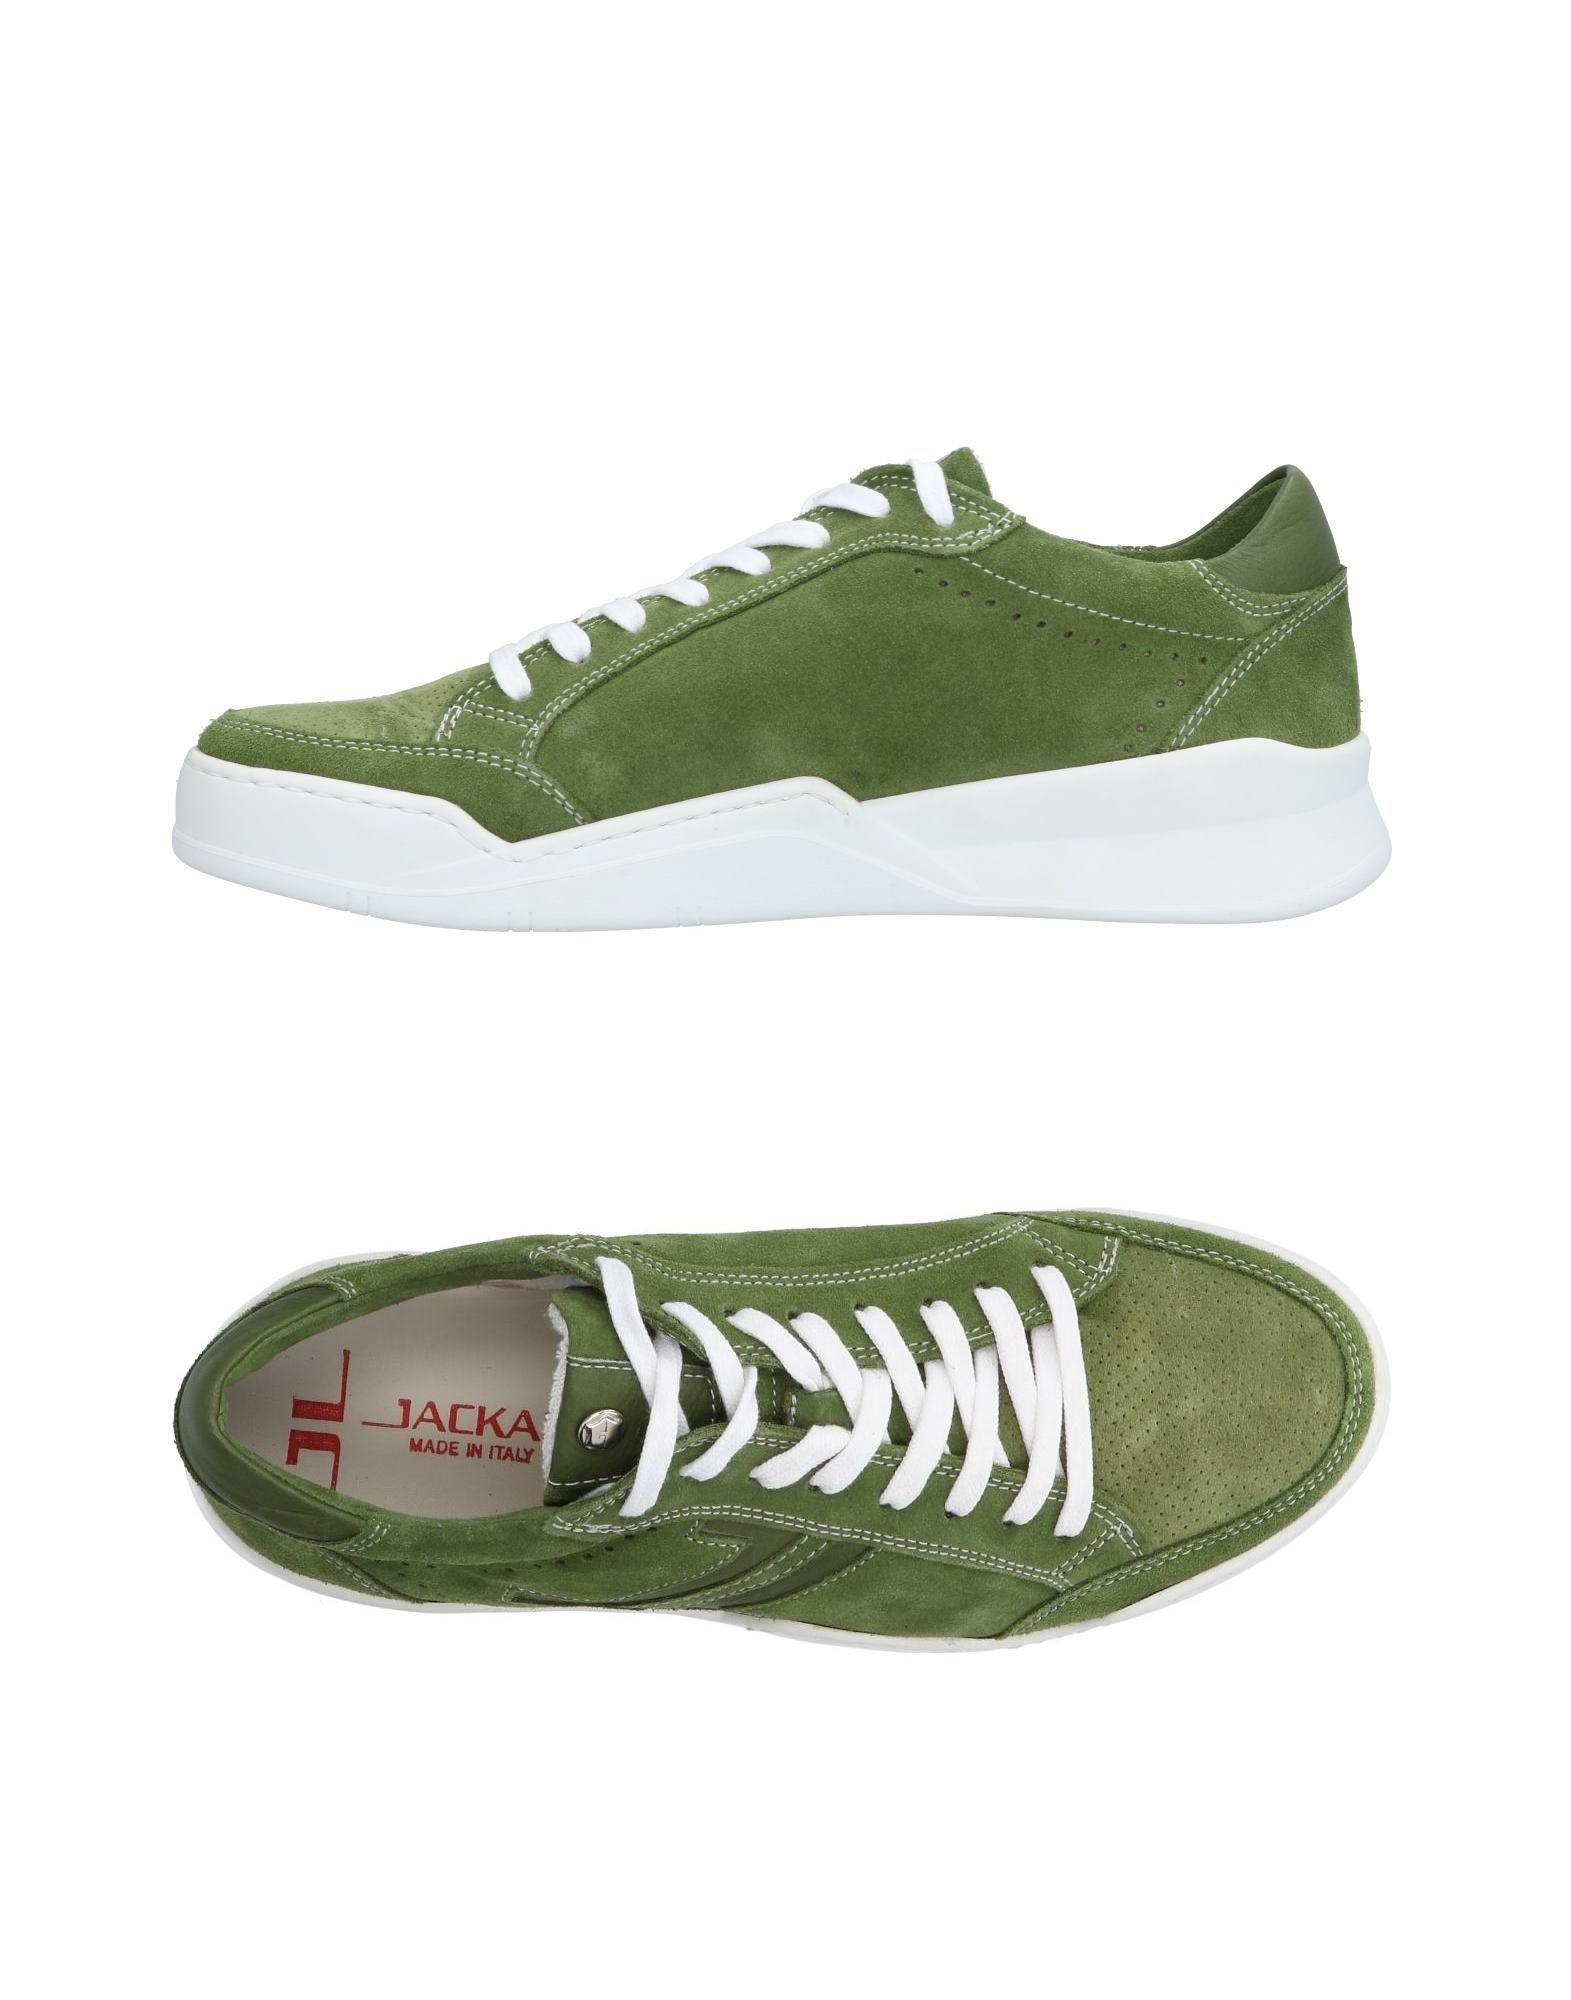 Jackal Jackal Jackal Sneakers - Men Jackal Sneakers online on  Australia - 11499919FC 93be7c